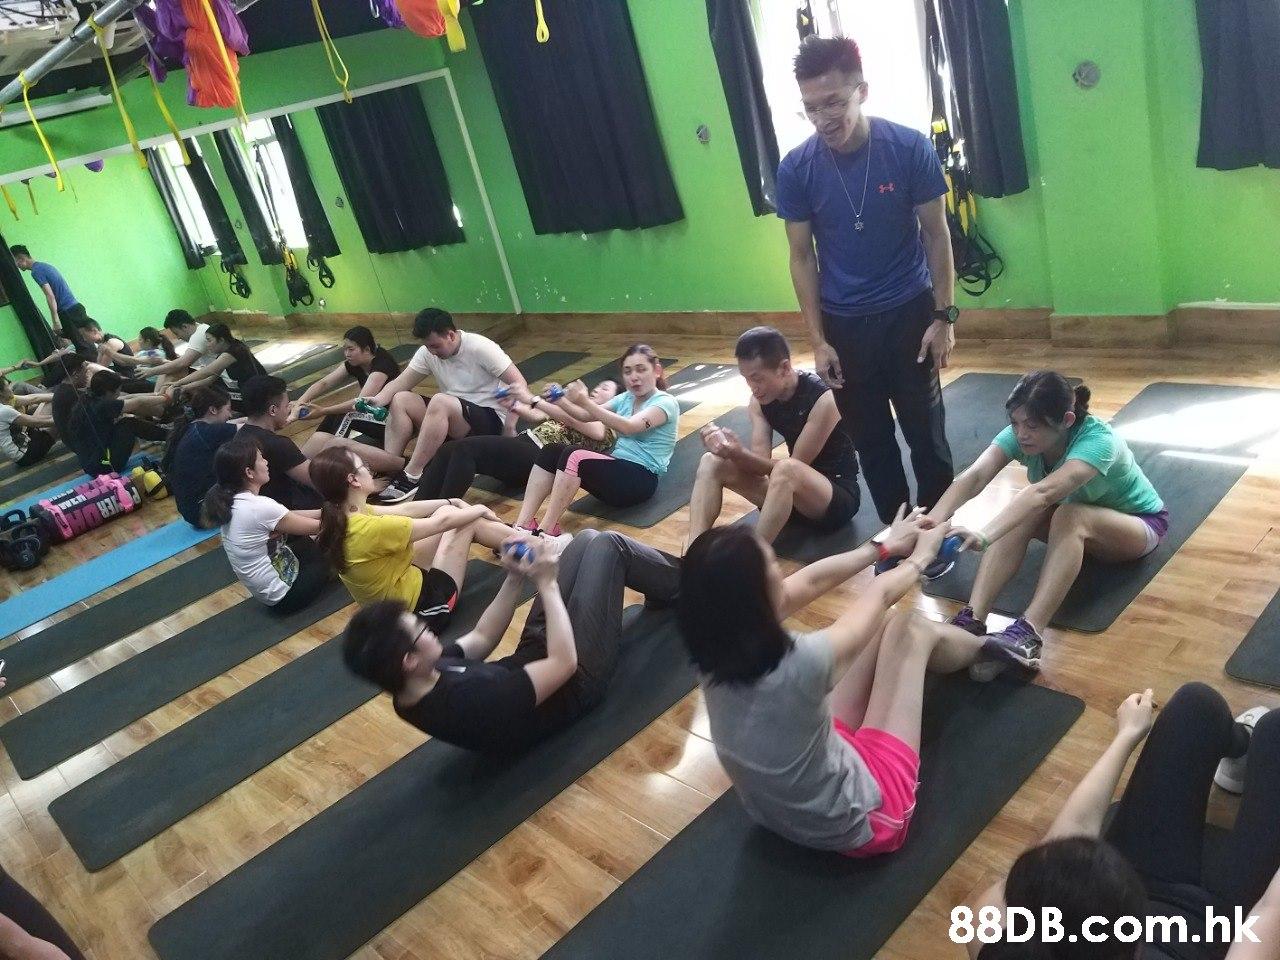 1T .hk  Physical fitness,Leg,Room,Leisure,Training